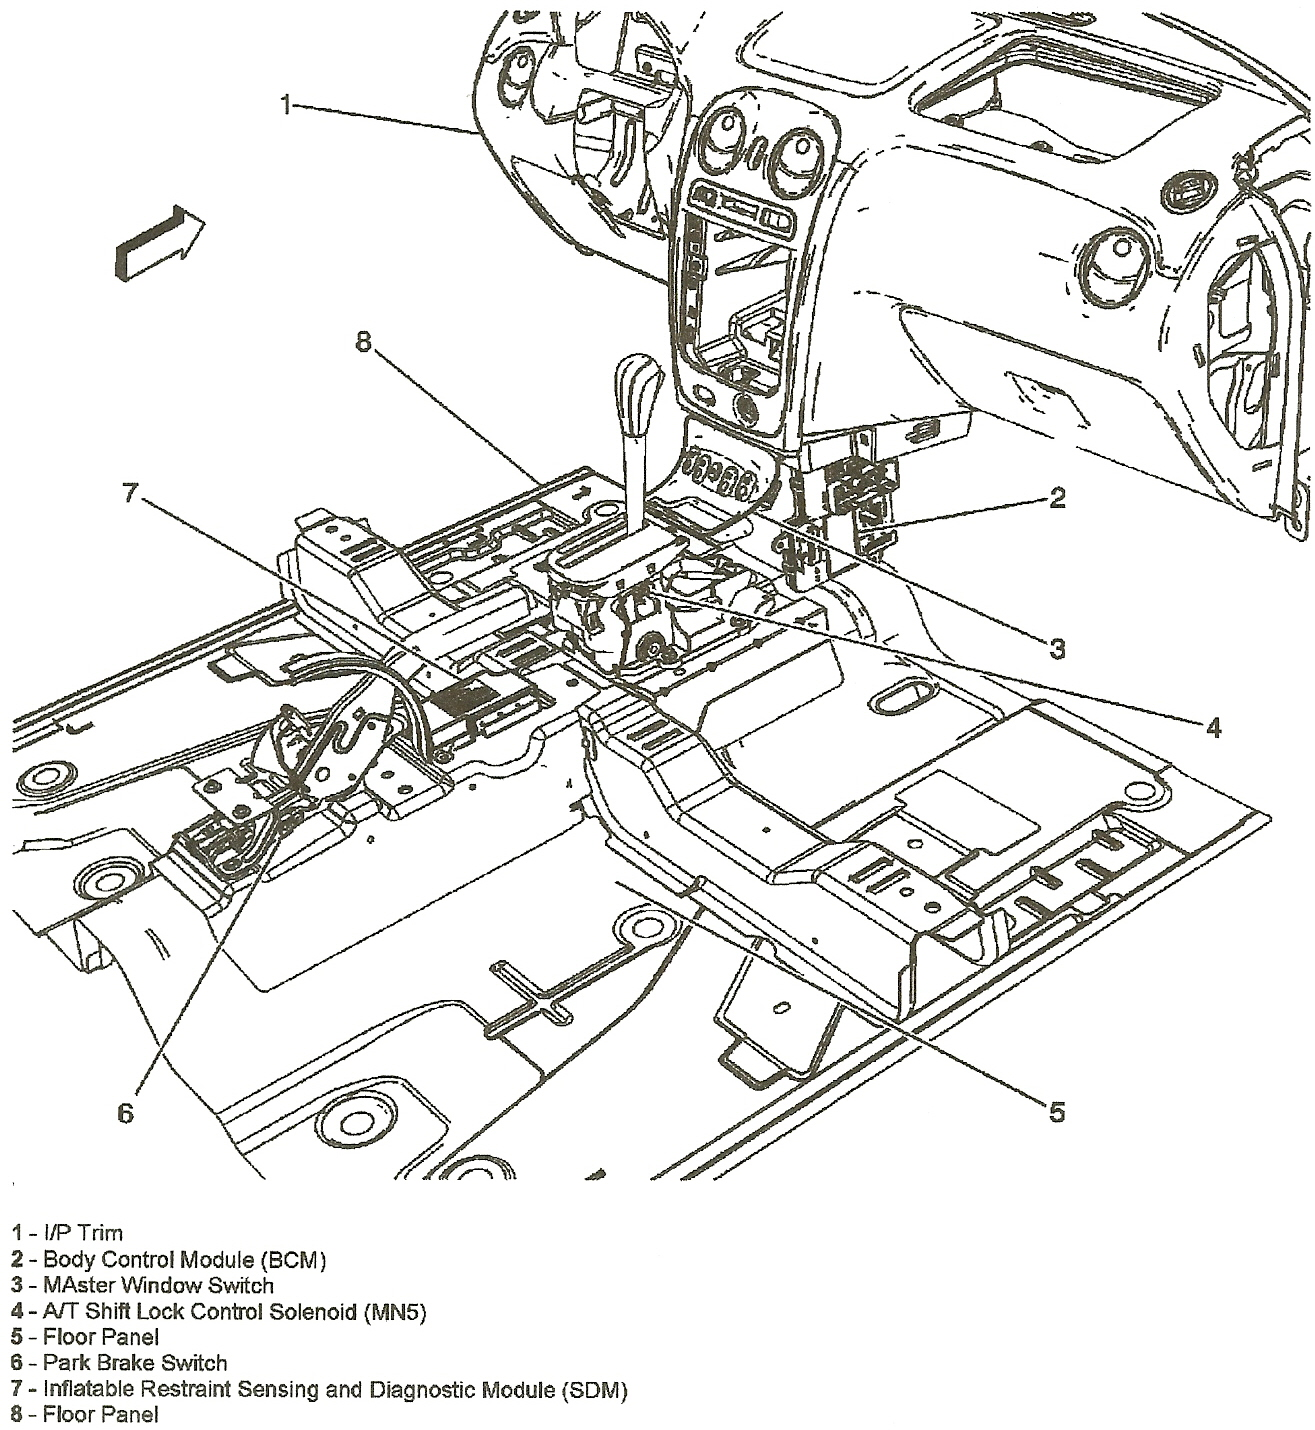 2011 Hhr Parts Diagram Trusted Wiring Chevy Body Diy Enthusiasts Diagrams U2022